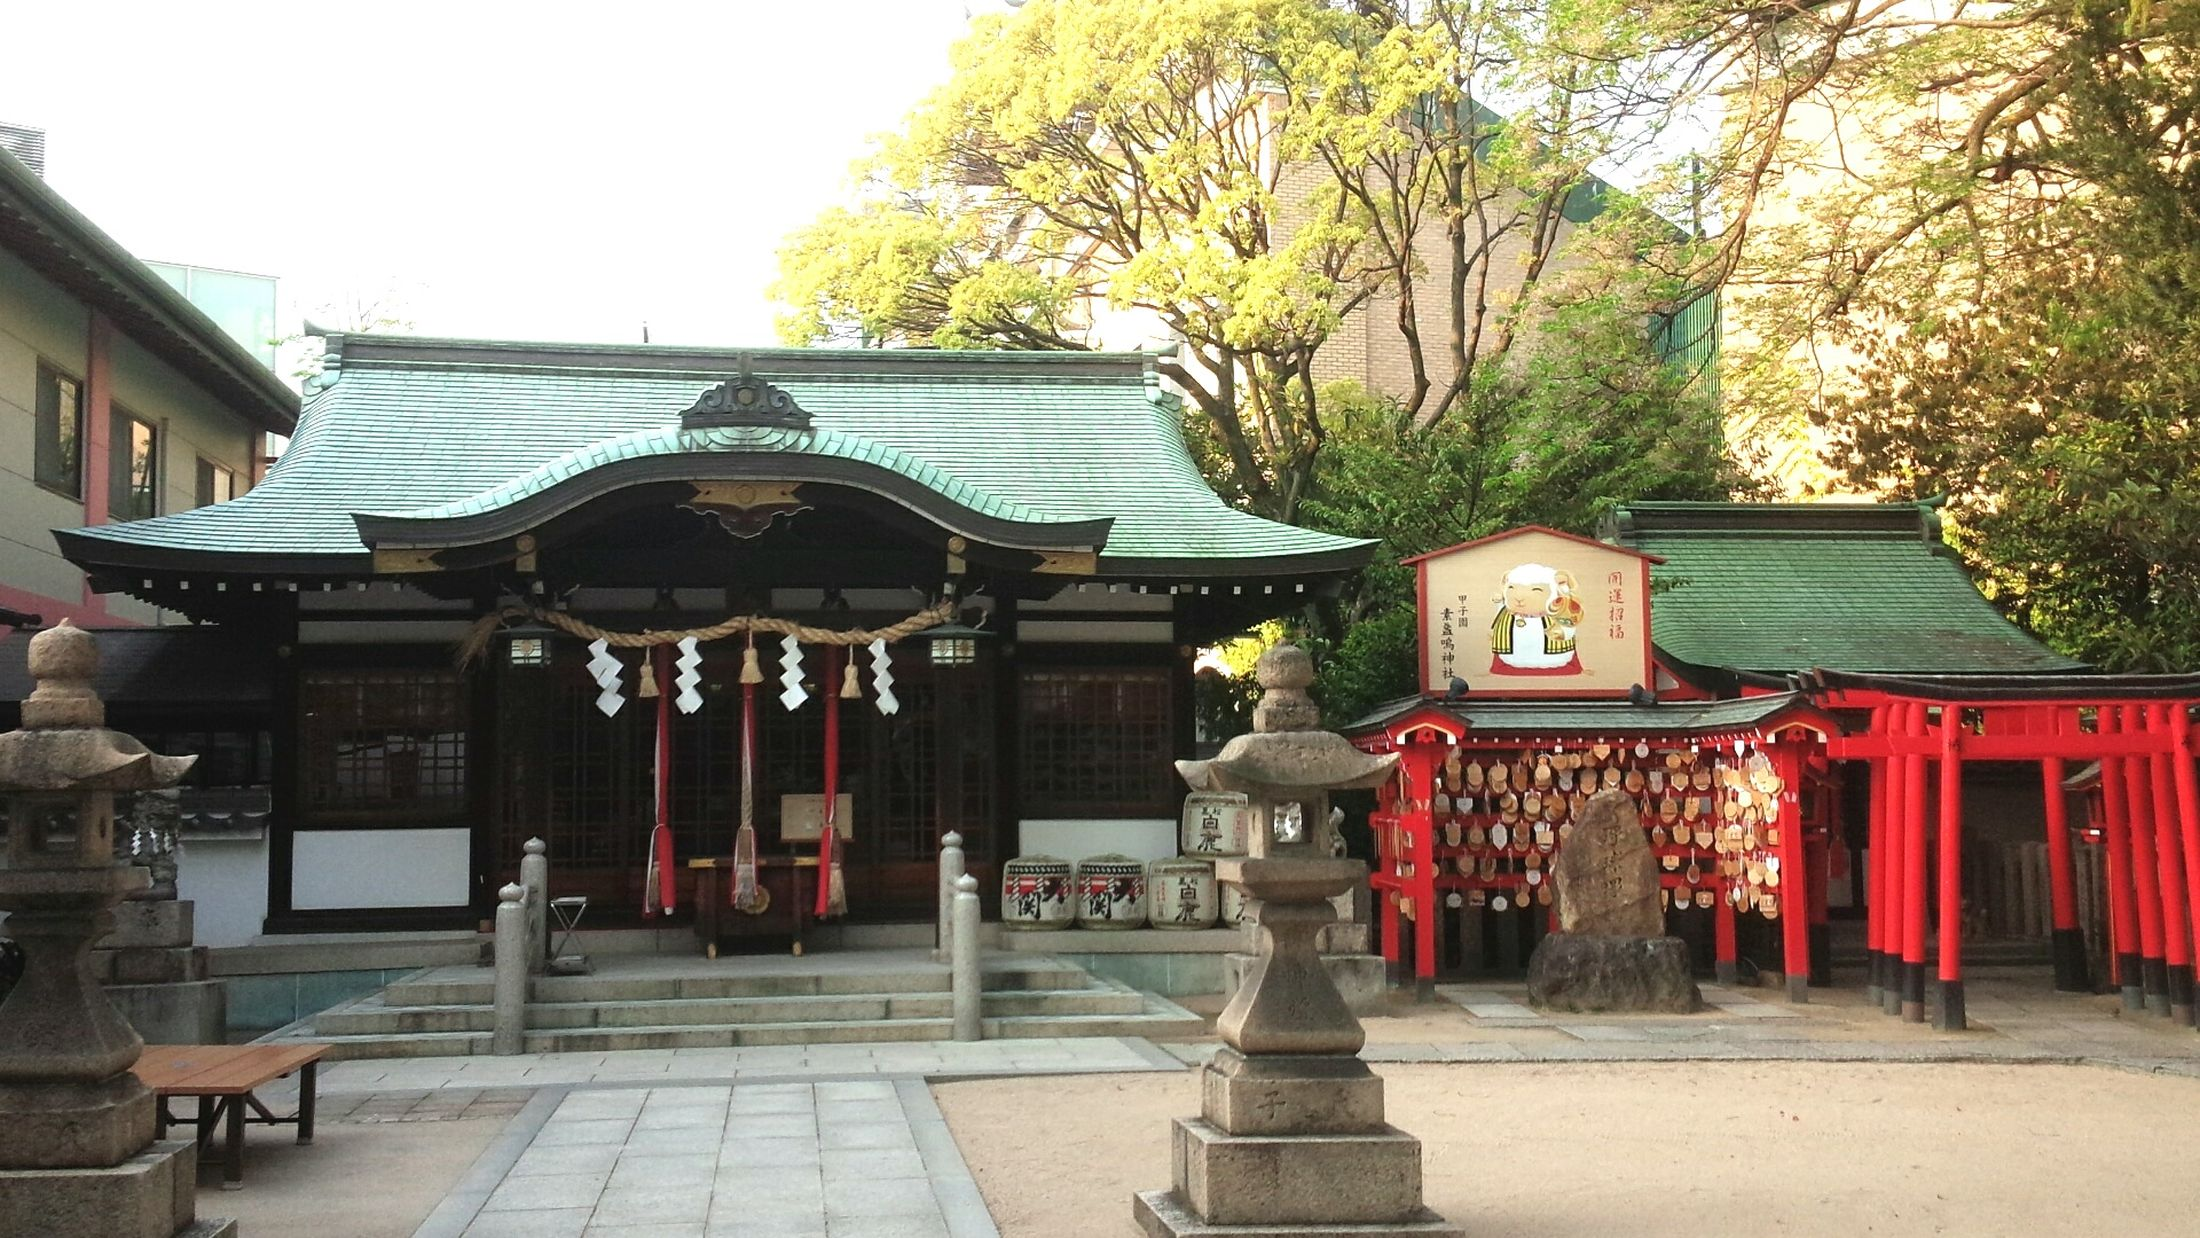 Streetphotography Taking Photos Shrine Nishinomiya